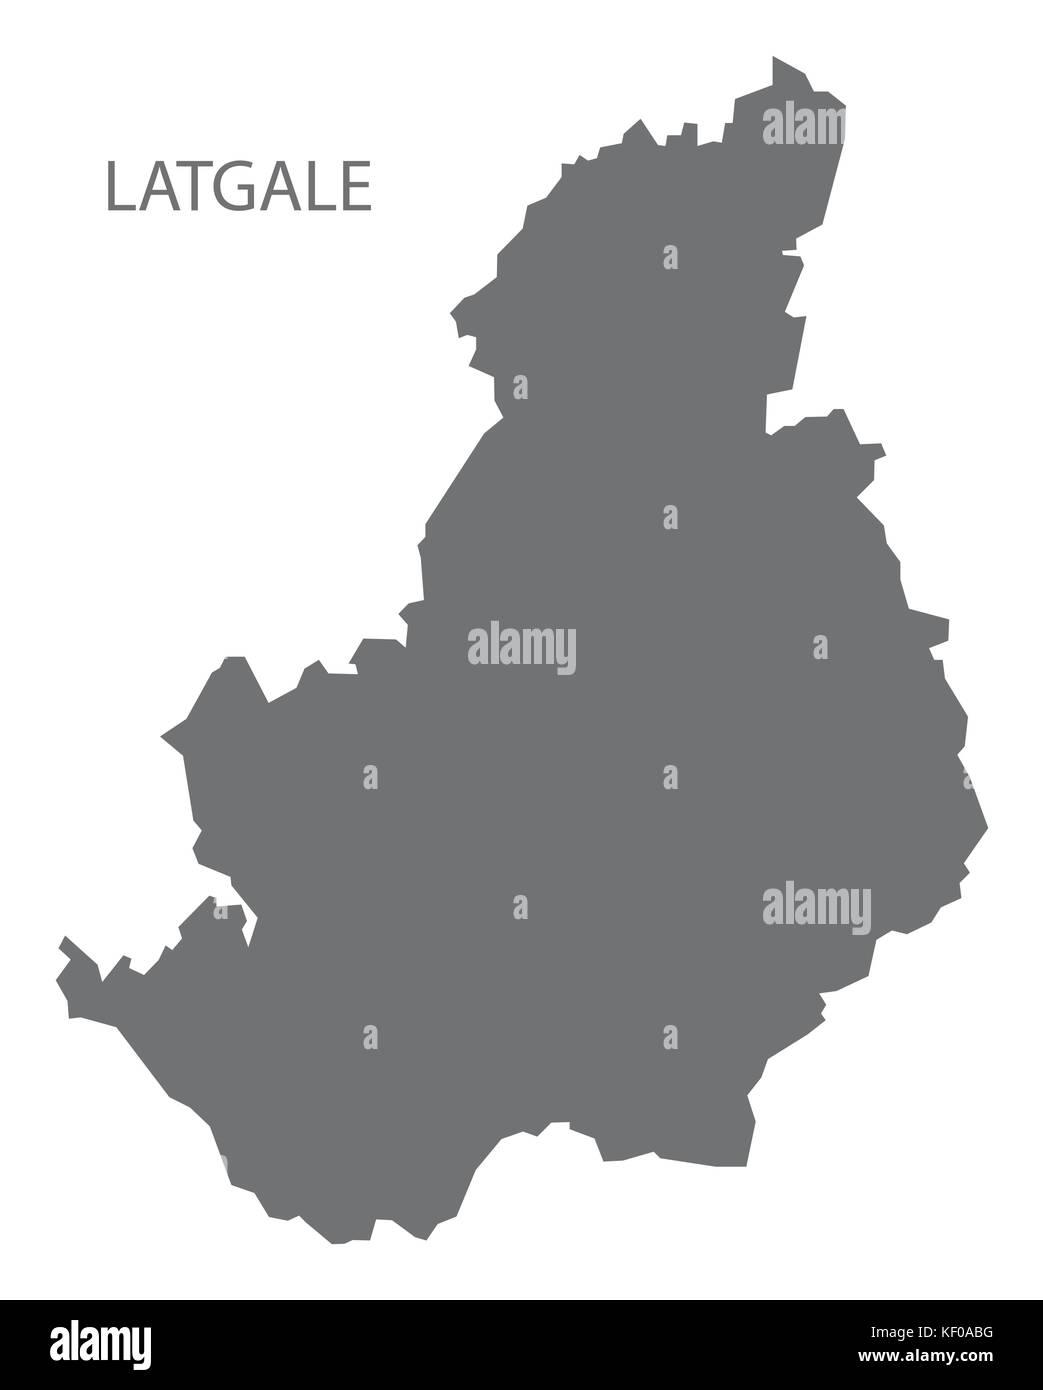 Latgale administrative division map of Latvia grey illustration silhouette shape - Stock Image